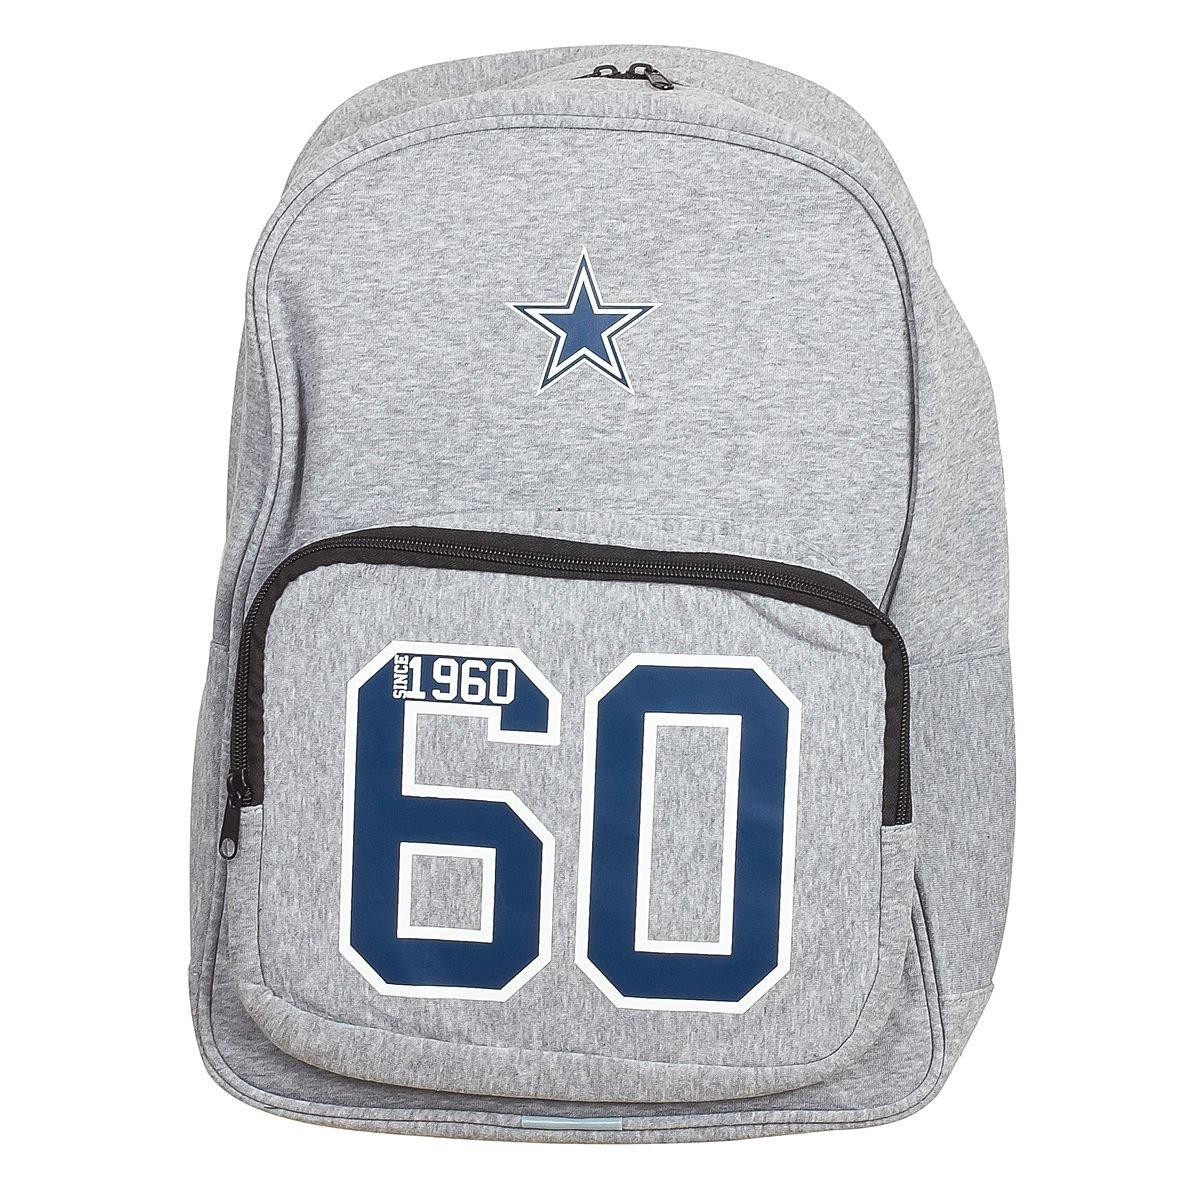 60 Dallas Cowboys Forever Collectibles Sac /à dos Est